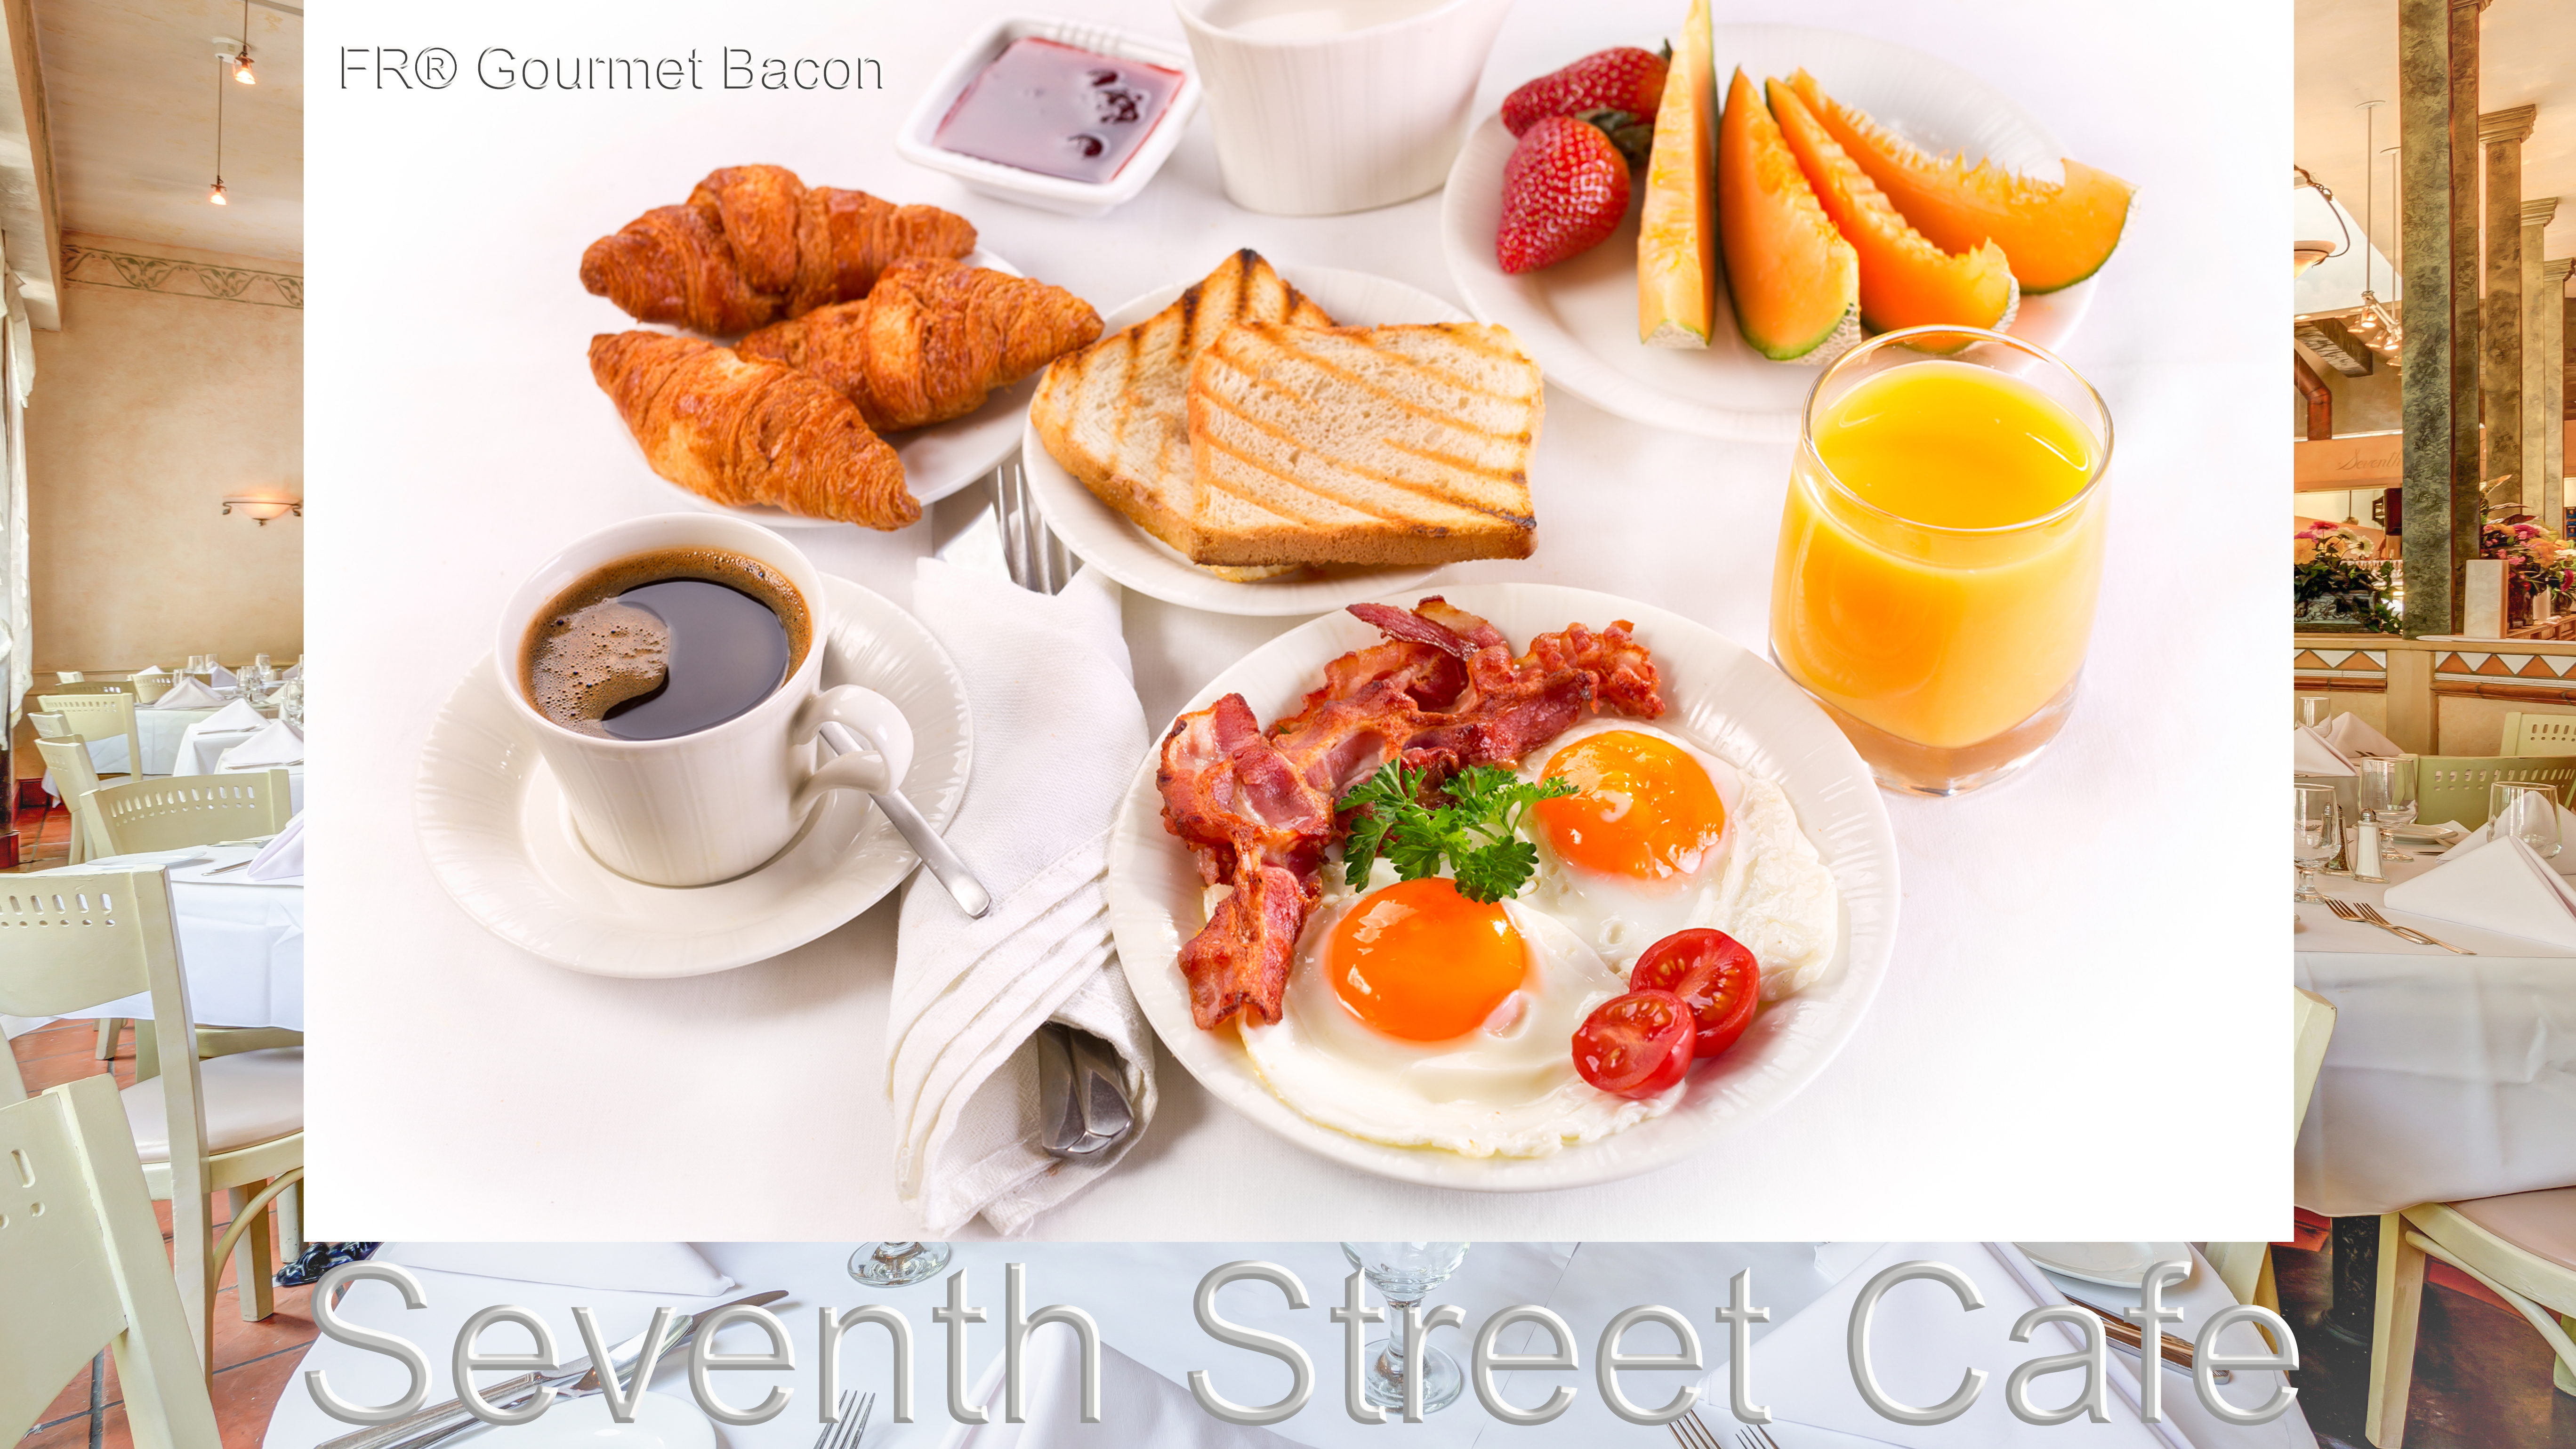 Seventh-Street-Cafe-06